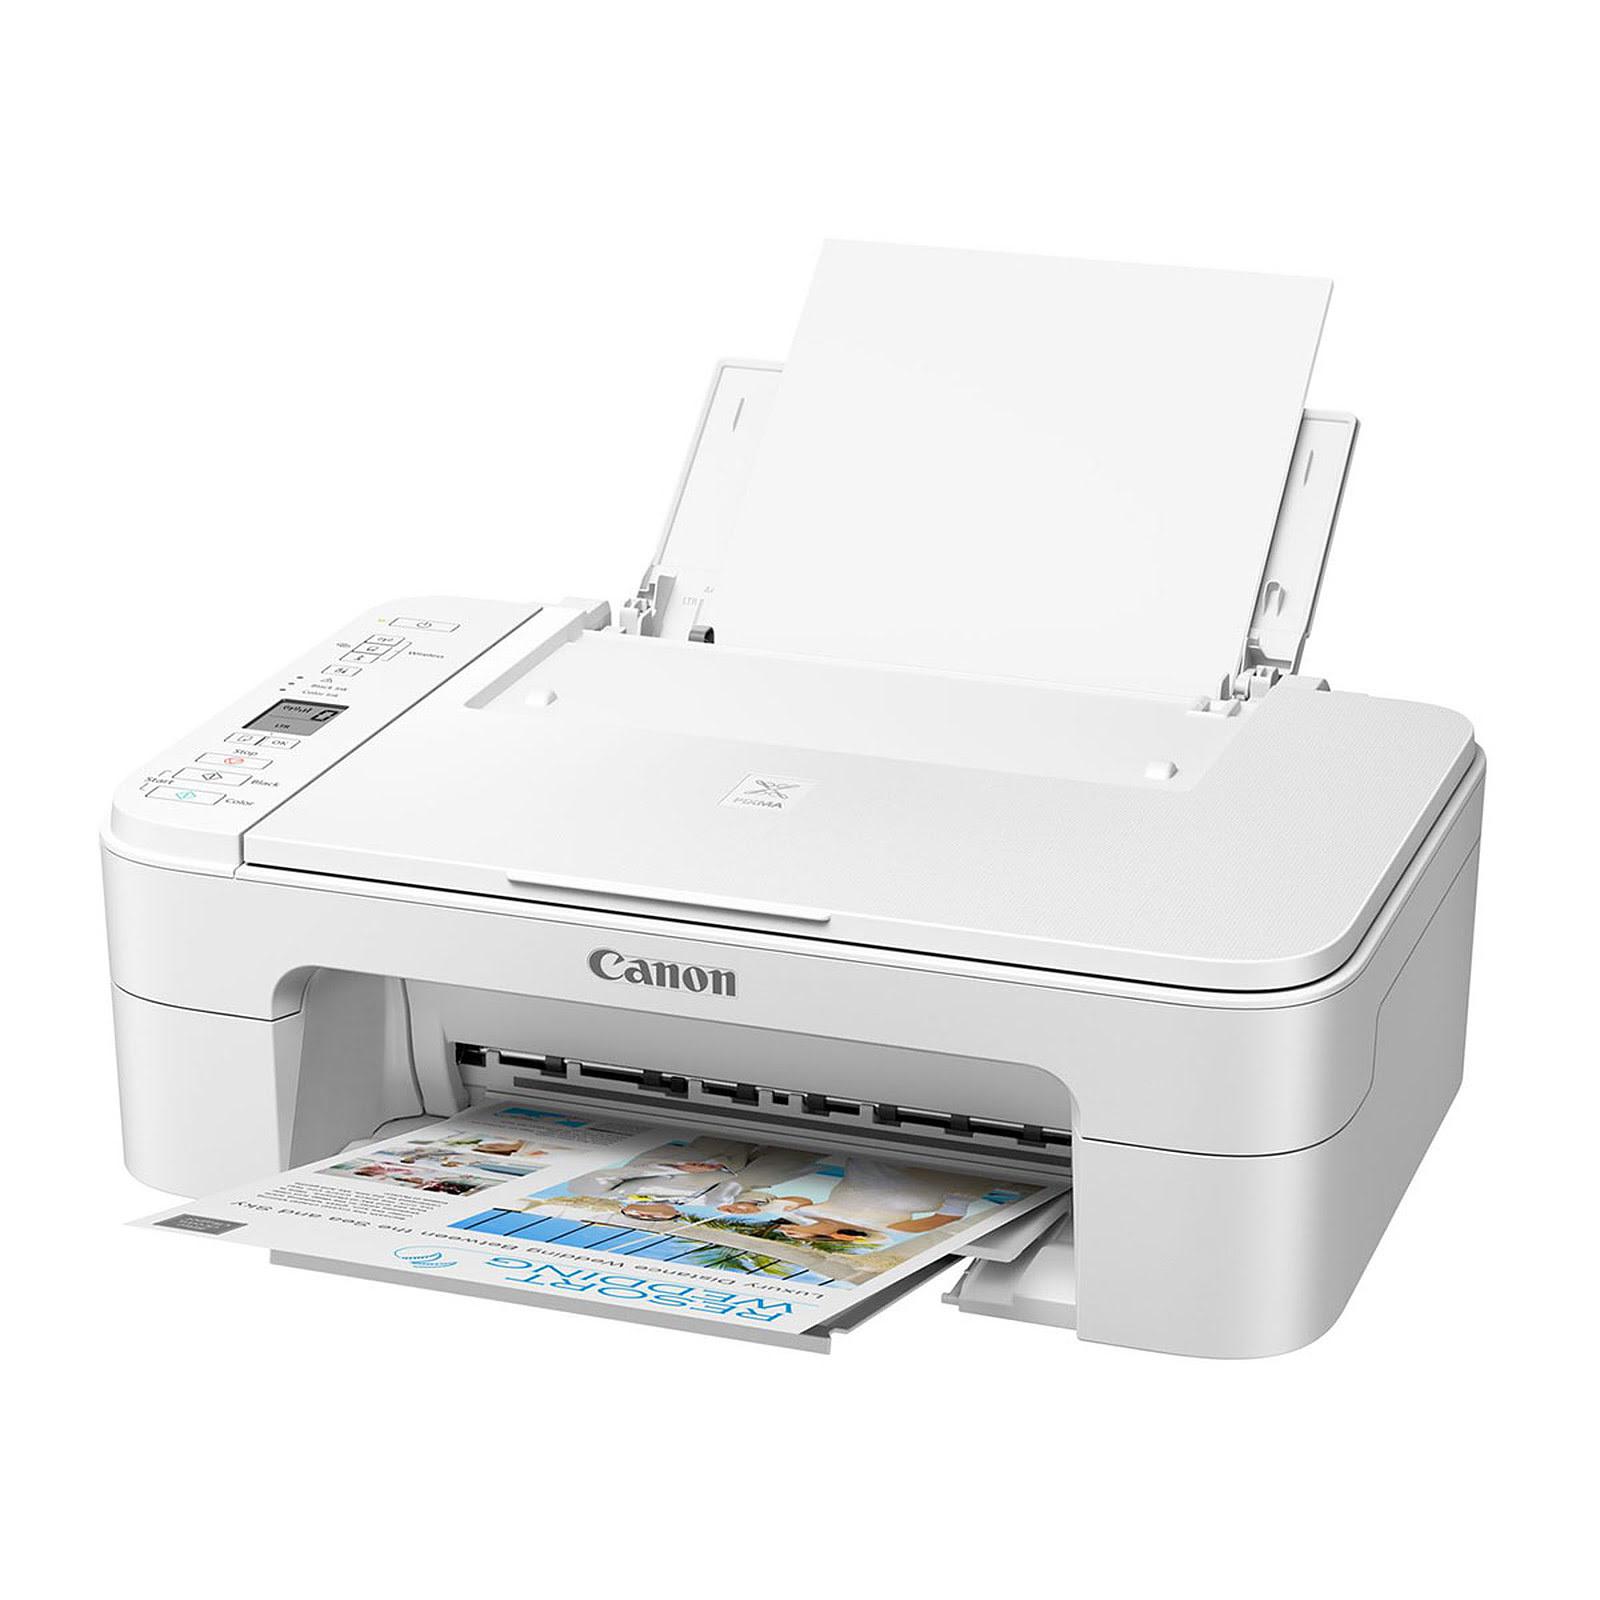 Imprimante multifonction Canon PIXMA TS3351 White - Cybertek.fr - 1